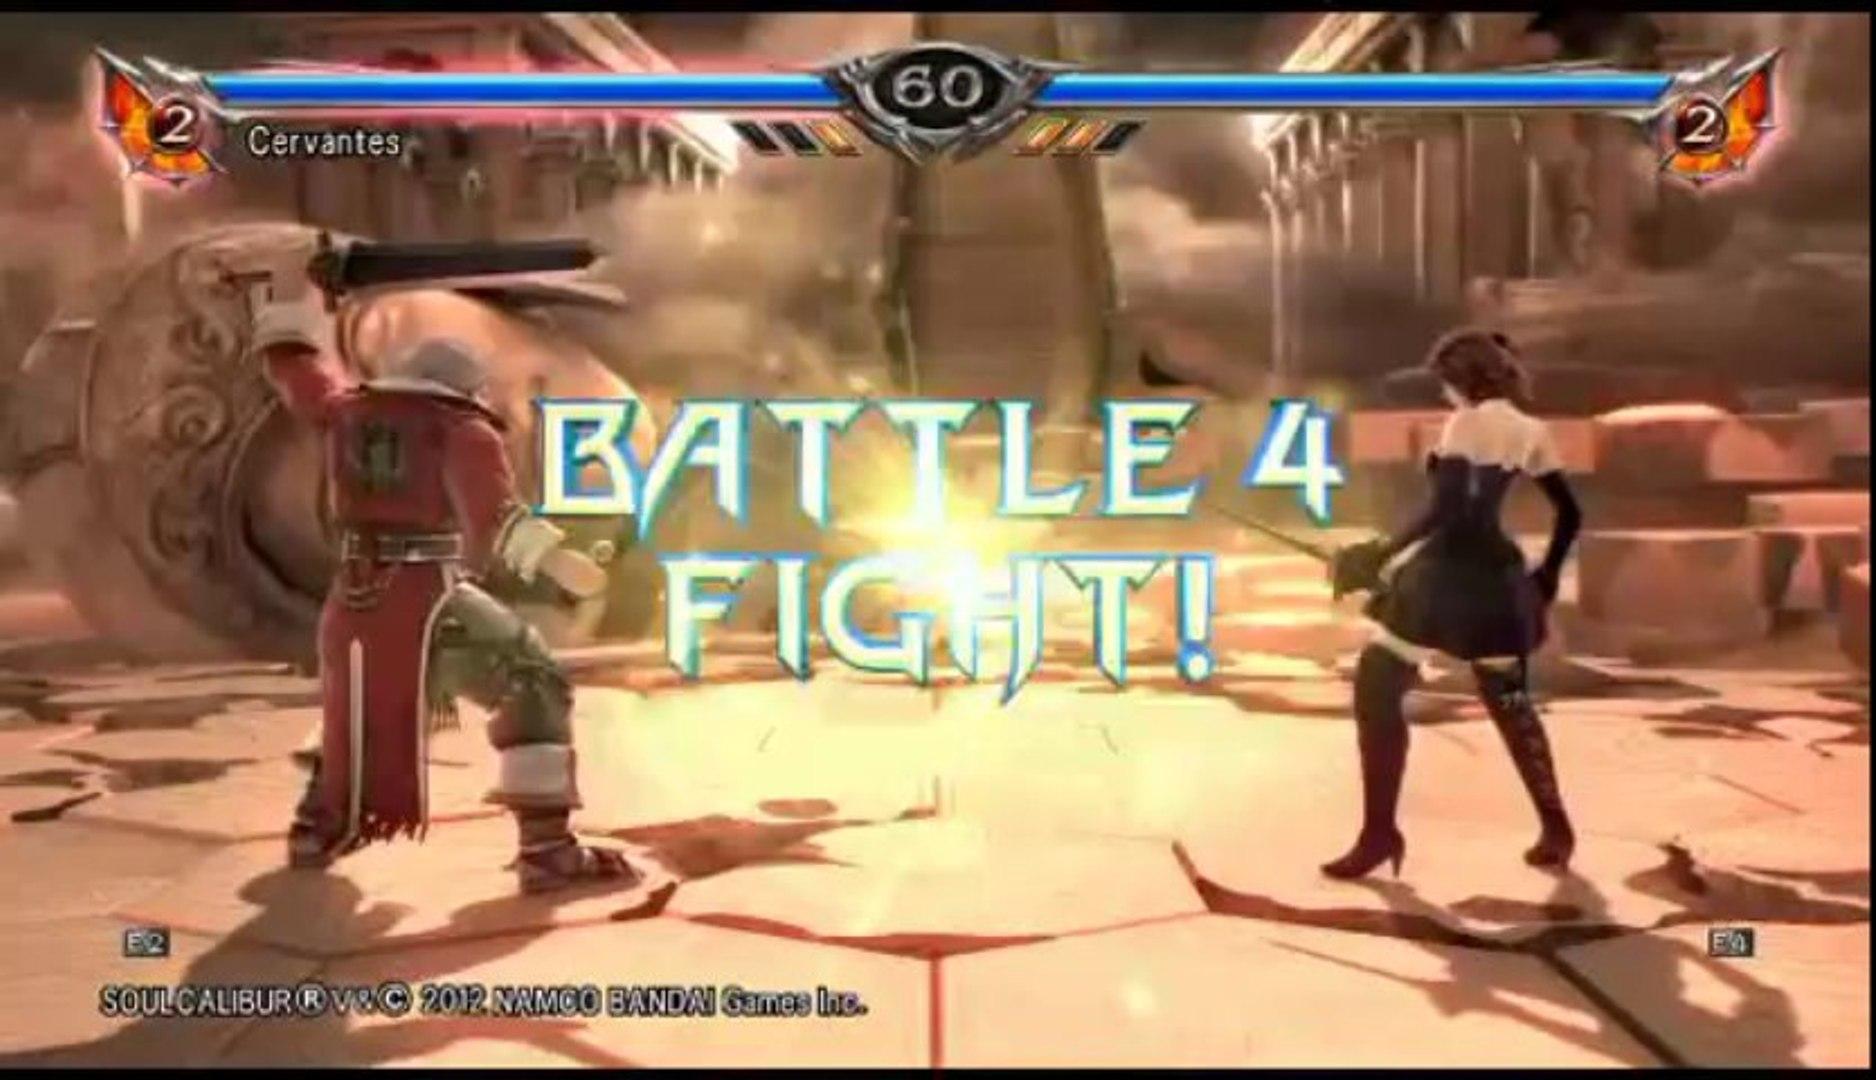 Soul Calibur V | Ranked Online Match - Cervantes Versus Amy